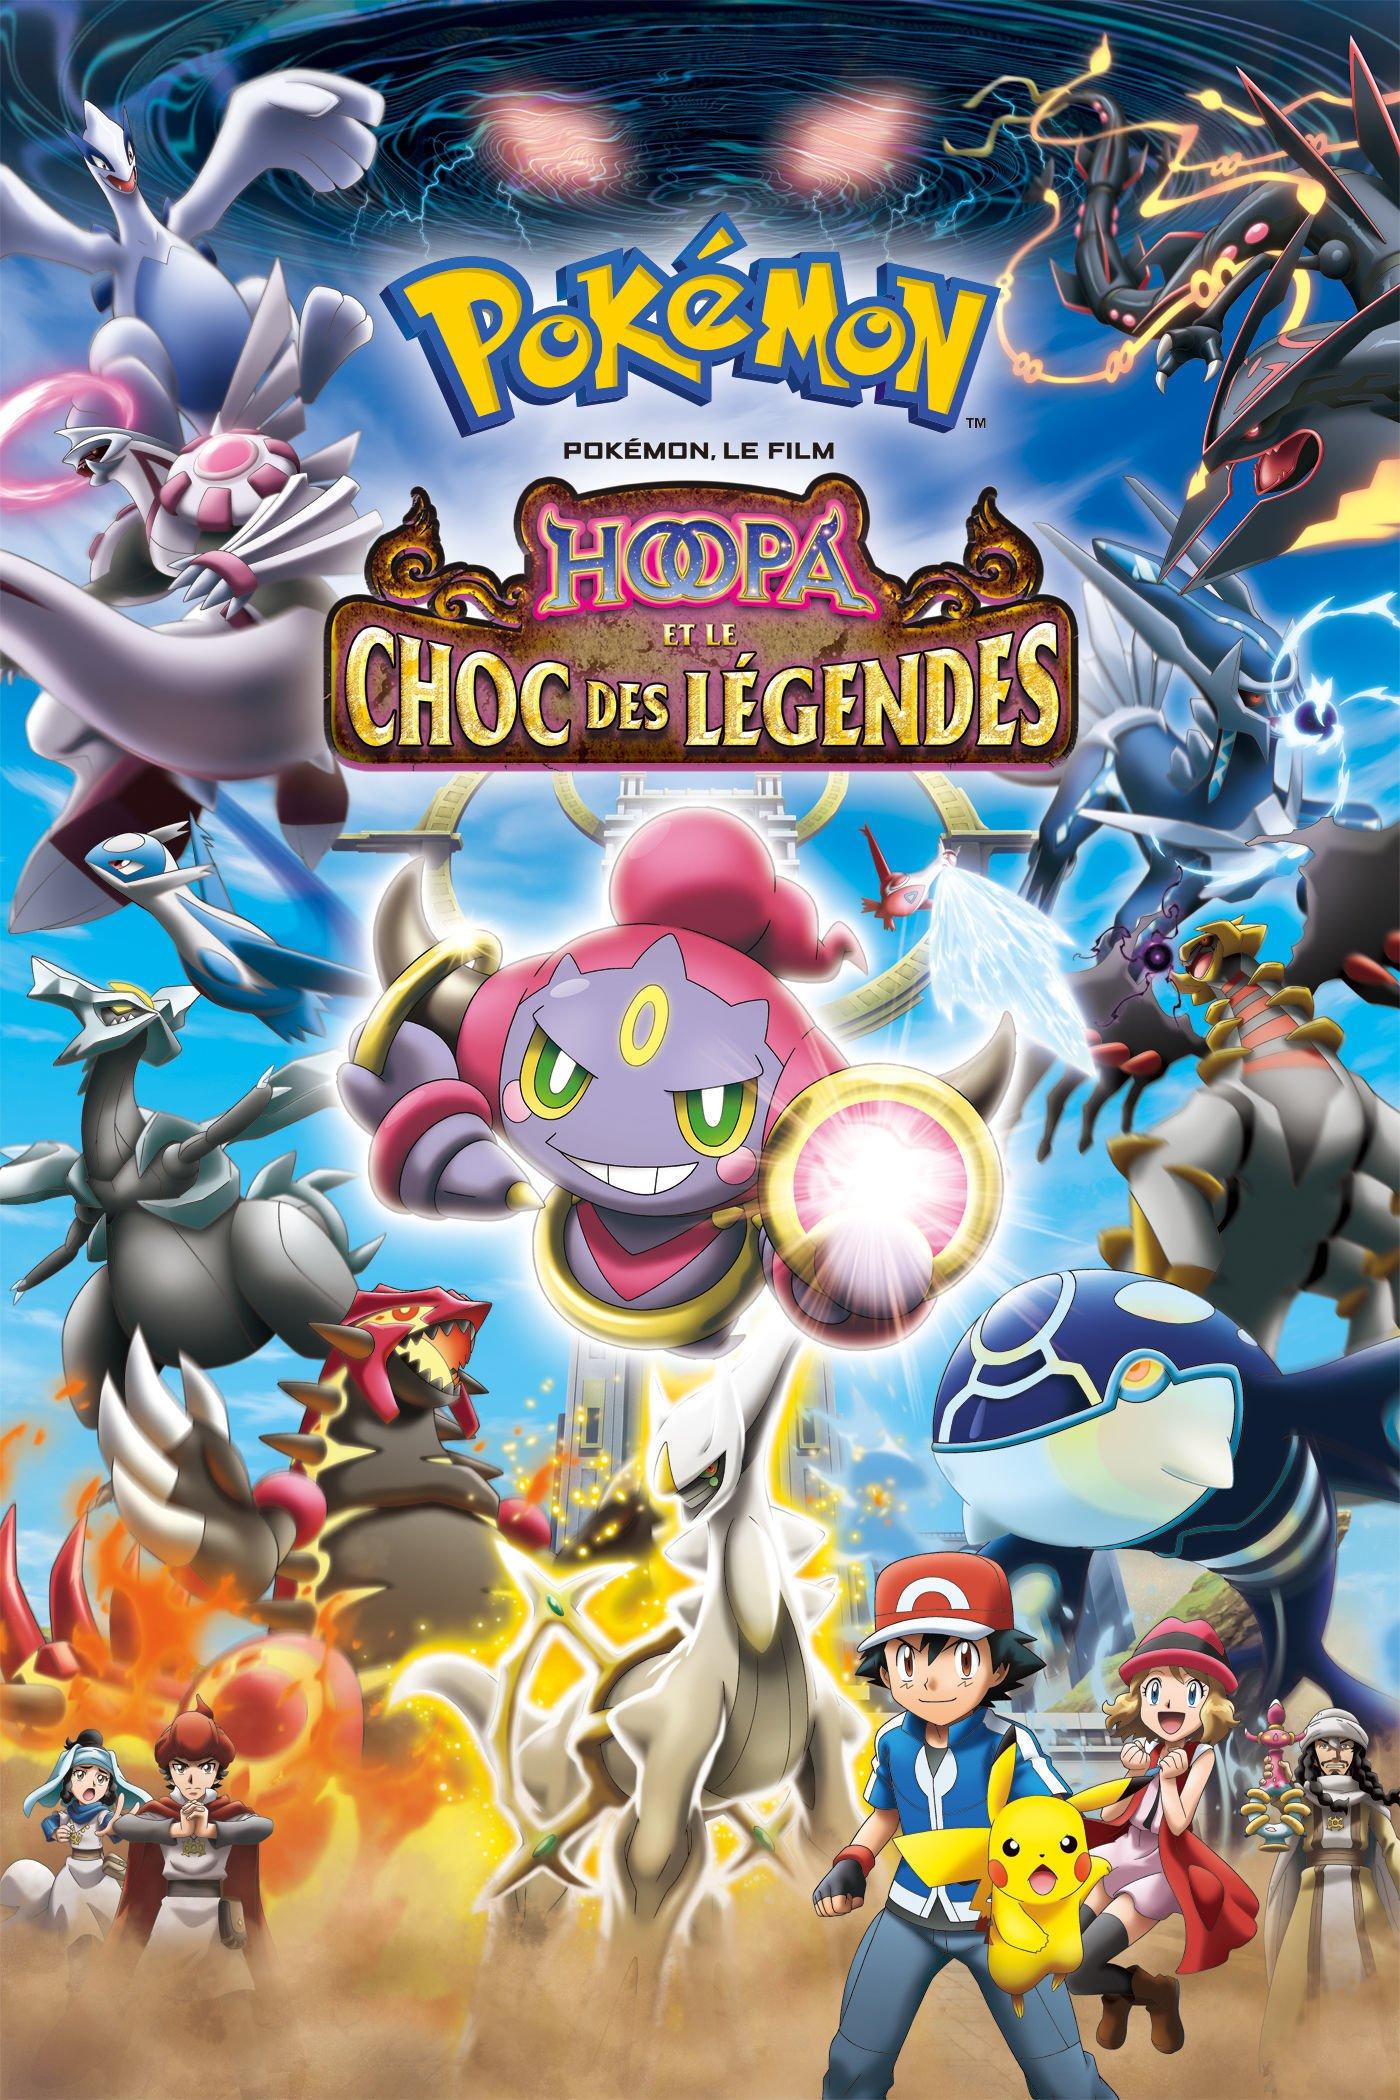 pokemon hoopa le choc des legendes EN STREAMING FRENCH DVDRIP